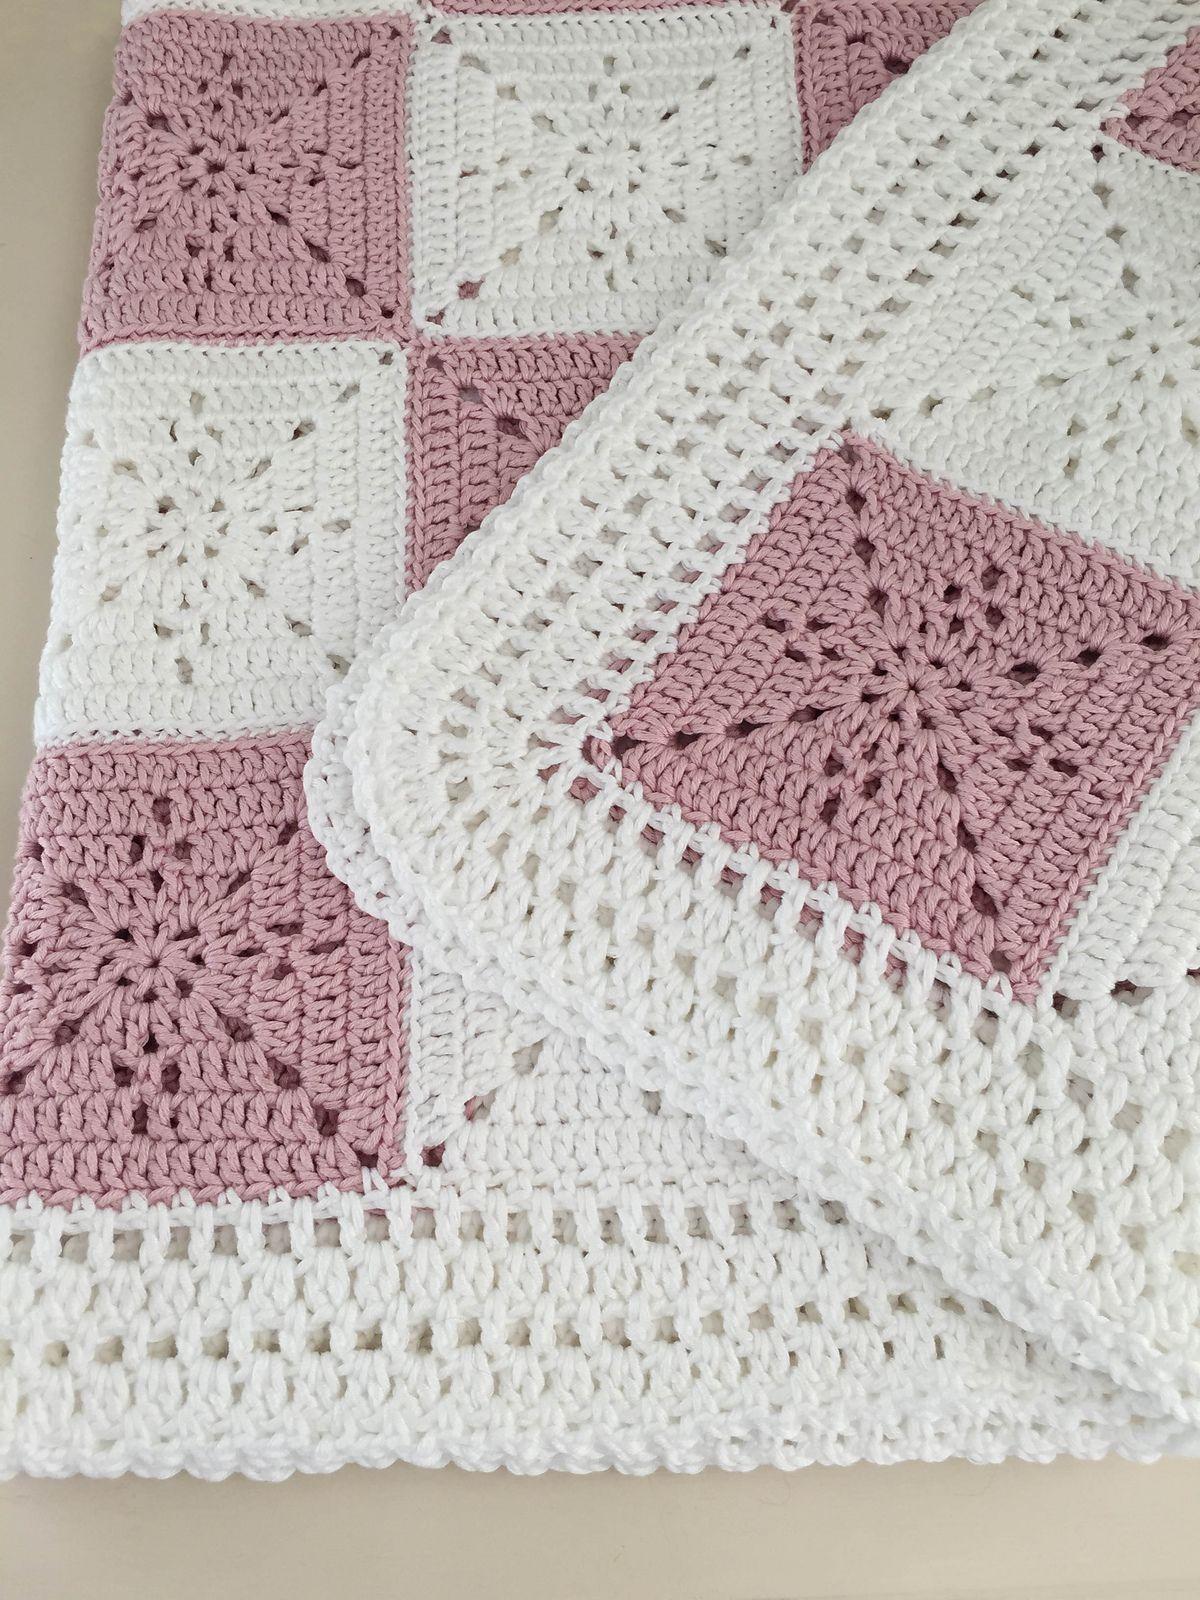 Ravelry: Arielle\'s Square Blanket by Deborah O\'Leary | crochet ...